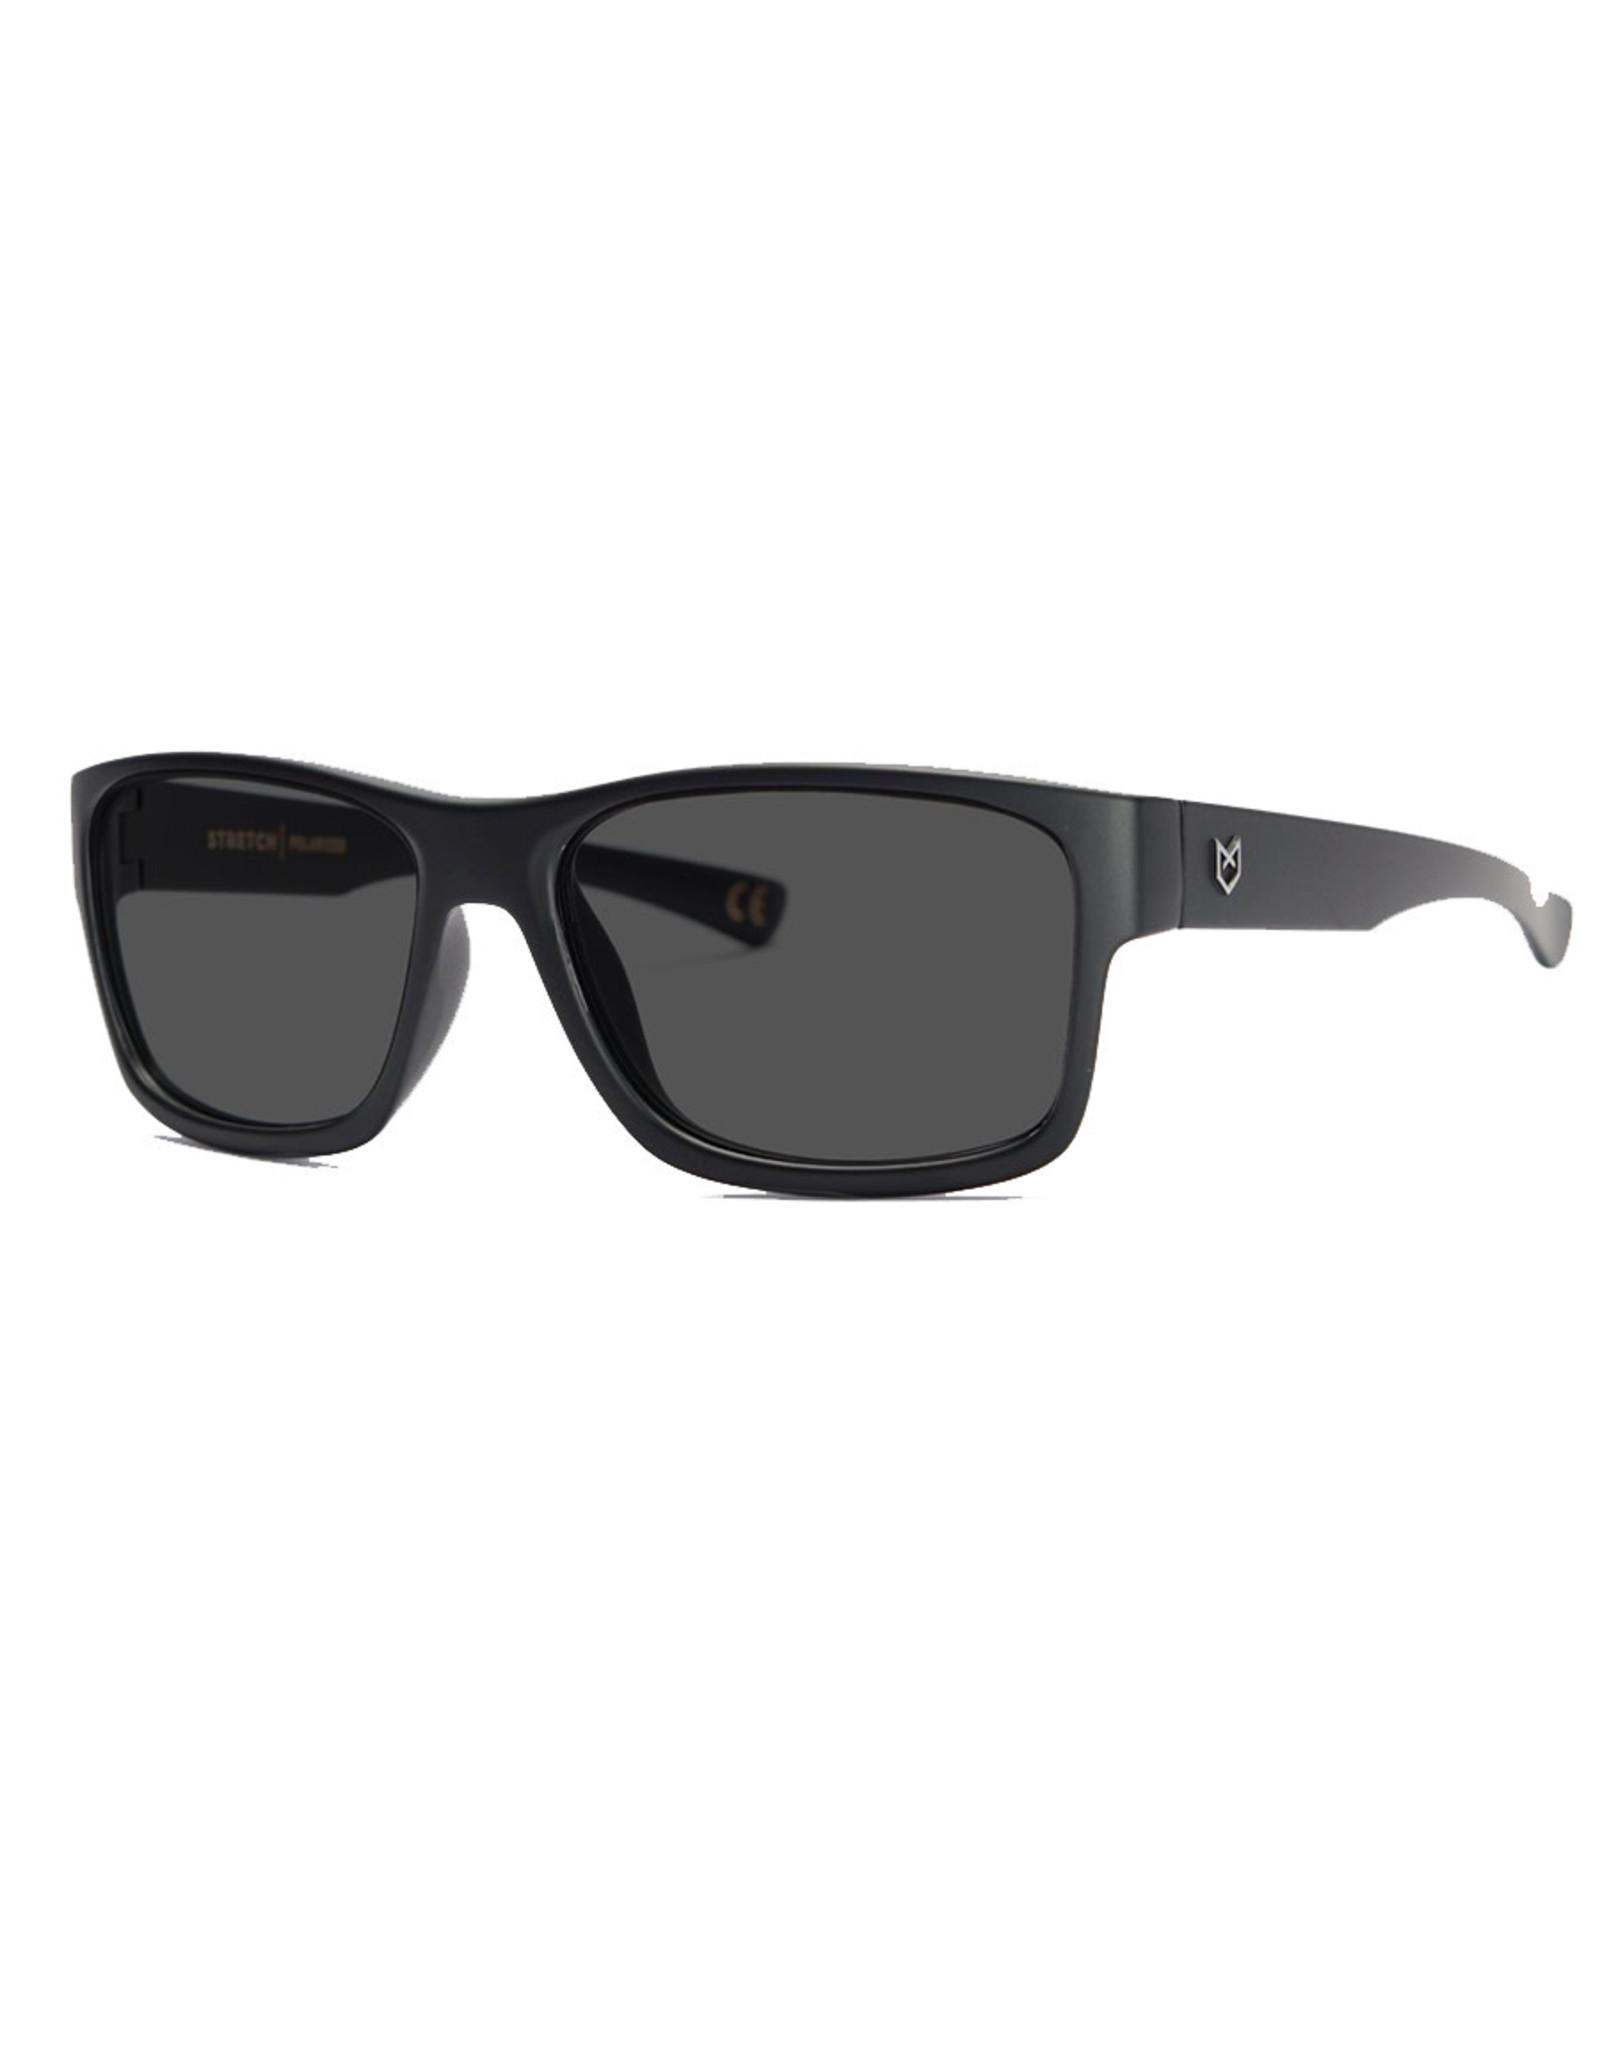 Madson Madson Sunglasses Stretch (Black On Black/Grey Polarized Lens)